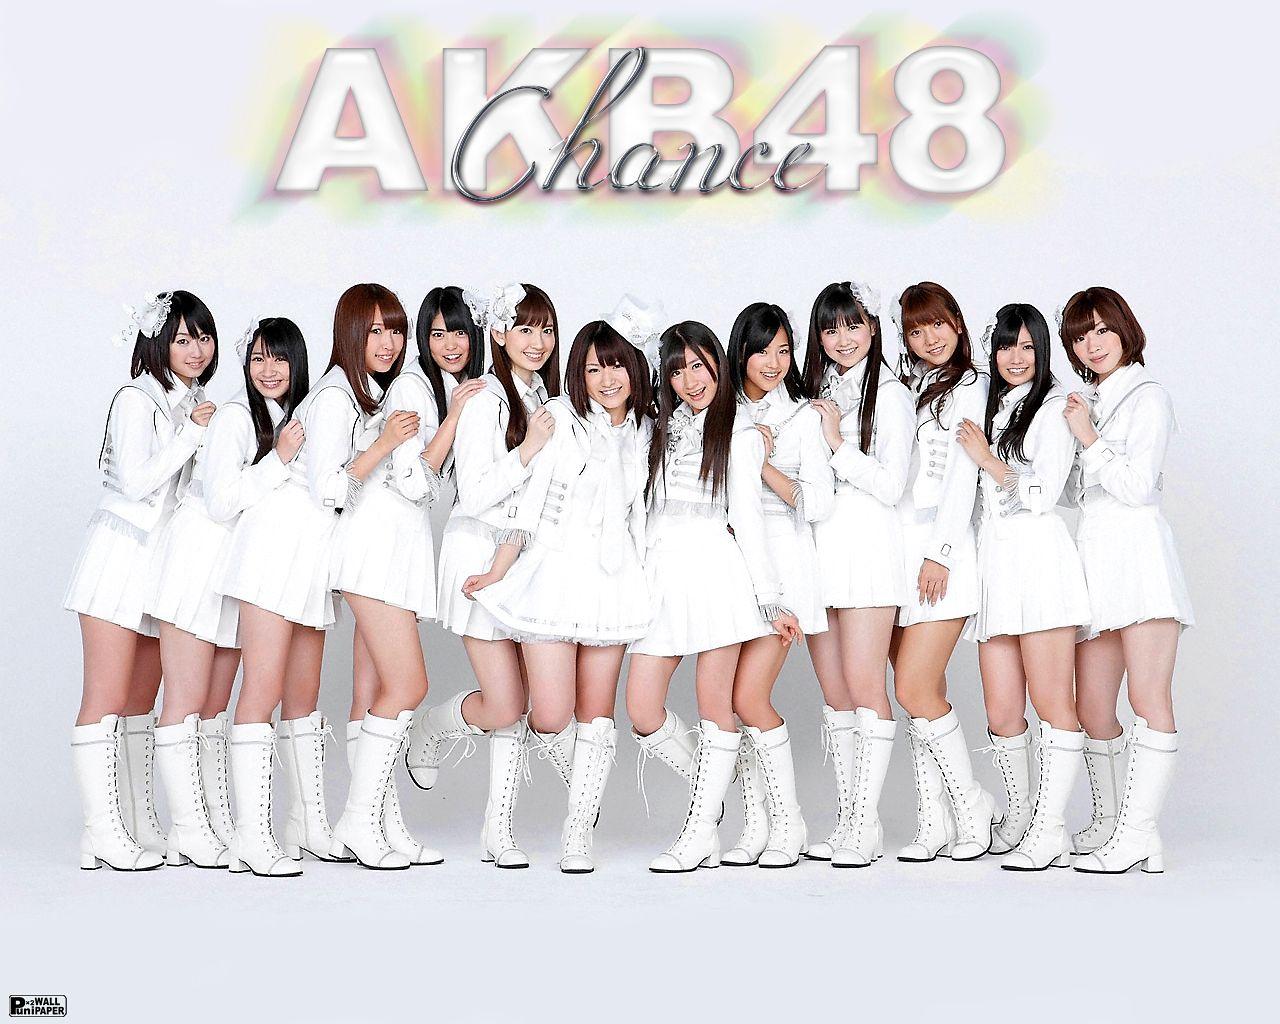 「AKB48」とは?-2005年に誕生した日本の女性アイドルグループ